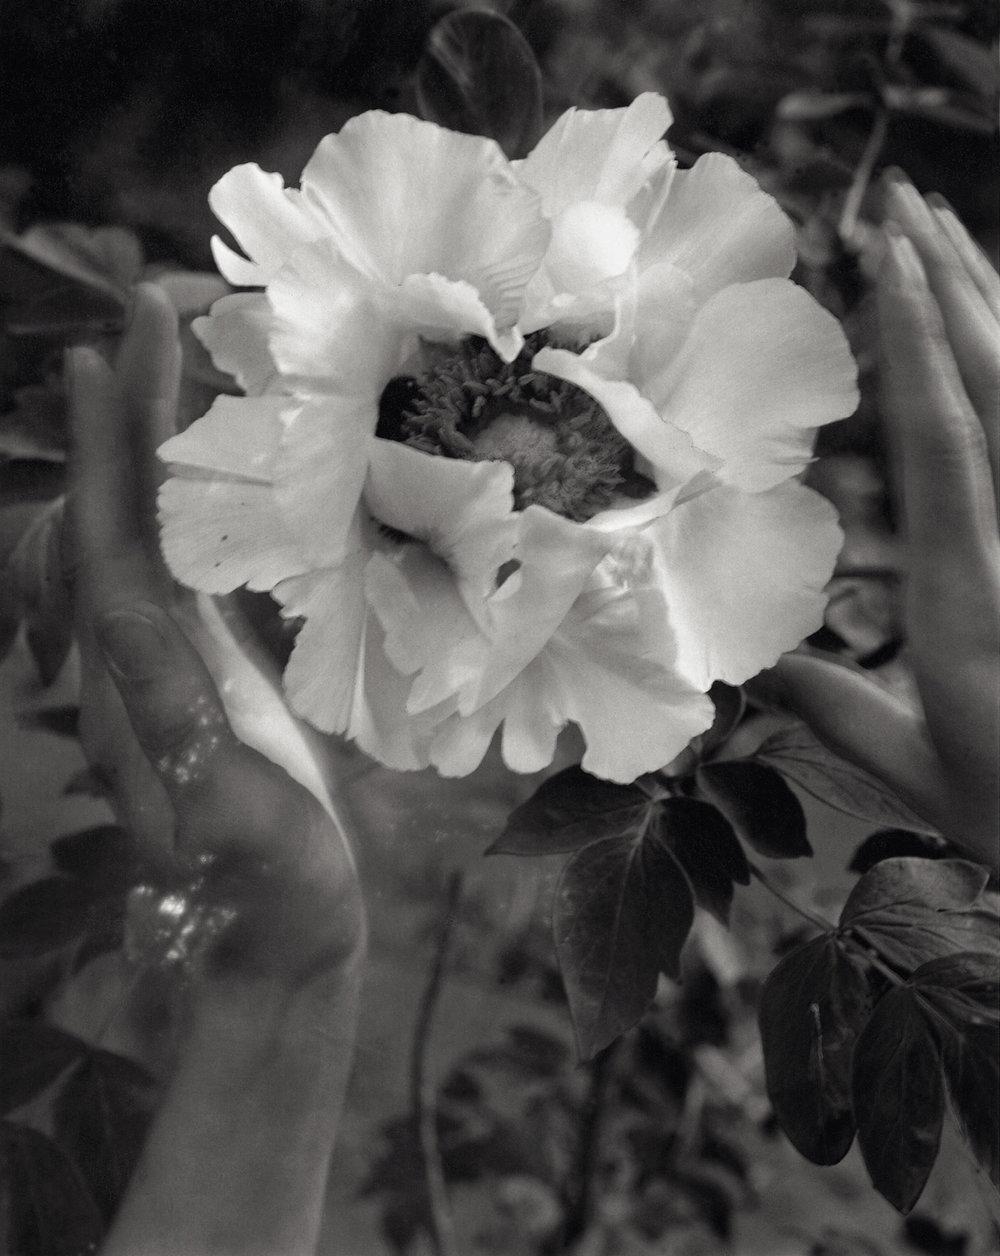 Beholding Paeonia Rockii, Linwood Gardens, Pavilion, New York,2007